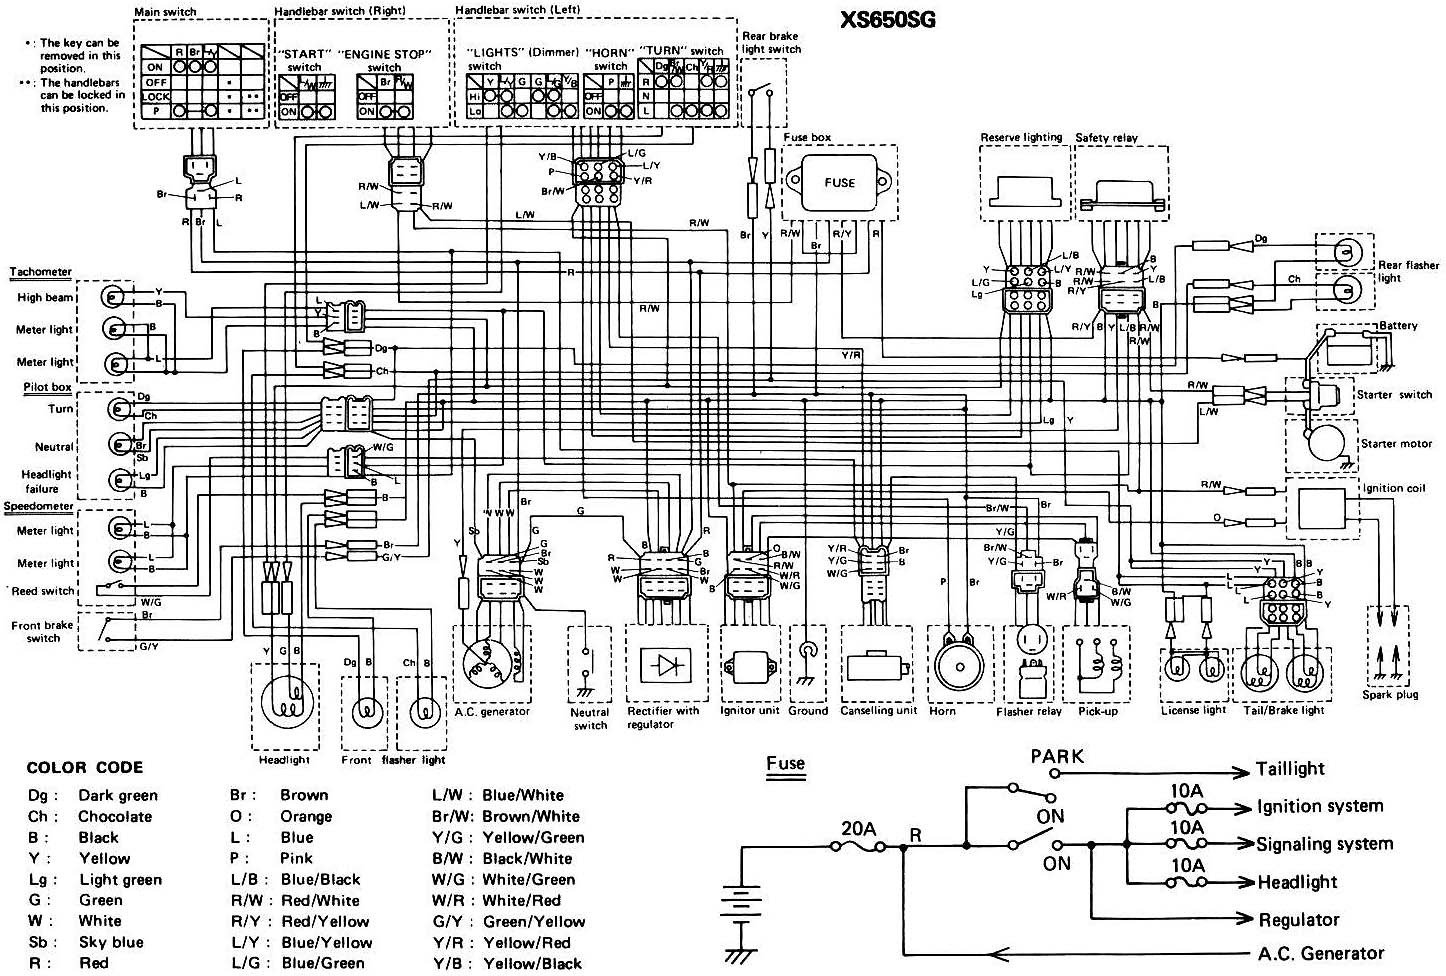 for parva, yamaha it, hp evinrude, honda crf, yamaha ty, yamaha bravo, on xt 250 wiring diagram